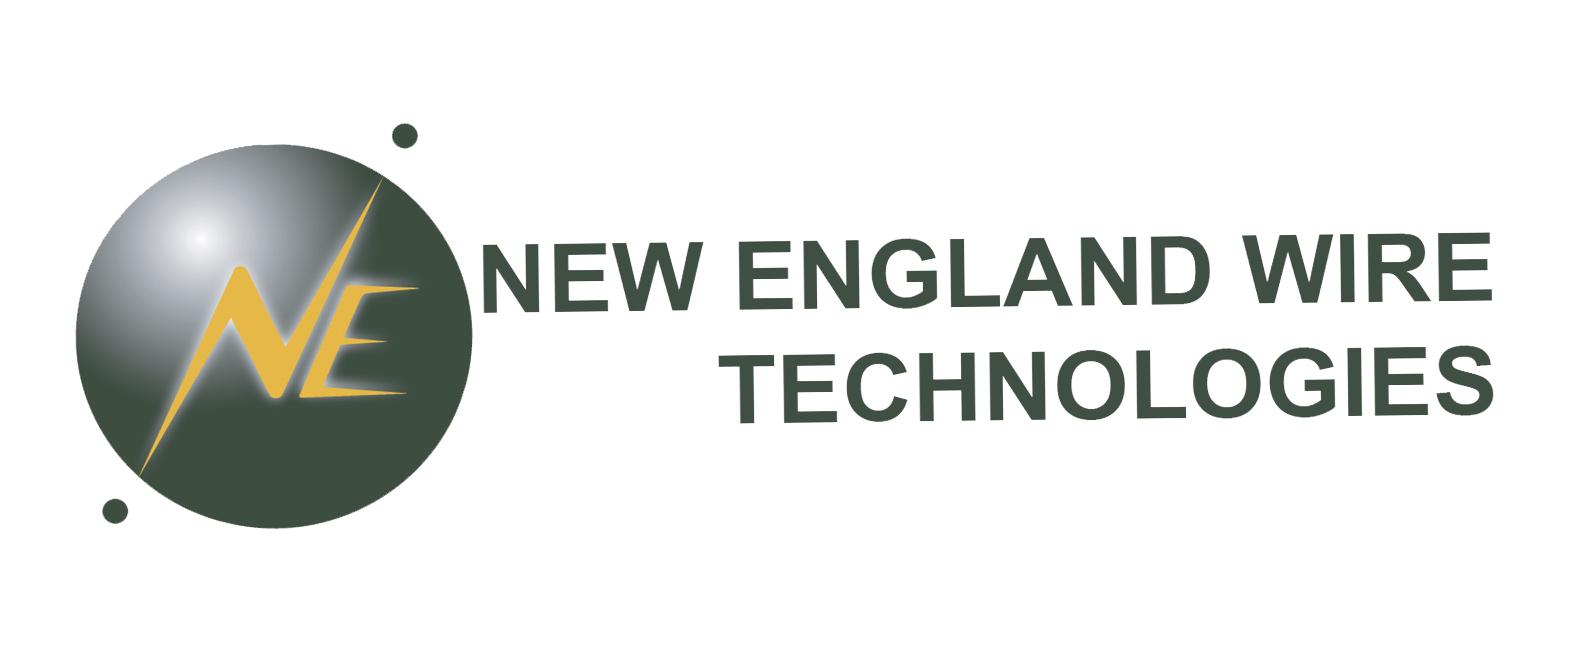 New England Wire Technologies logo